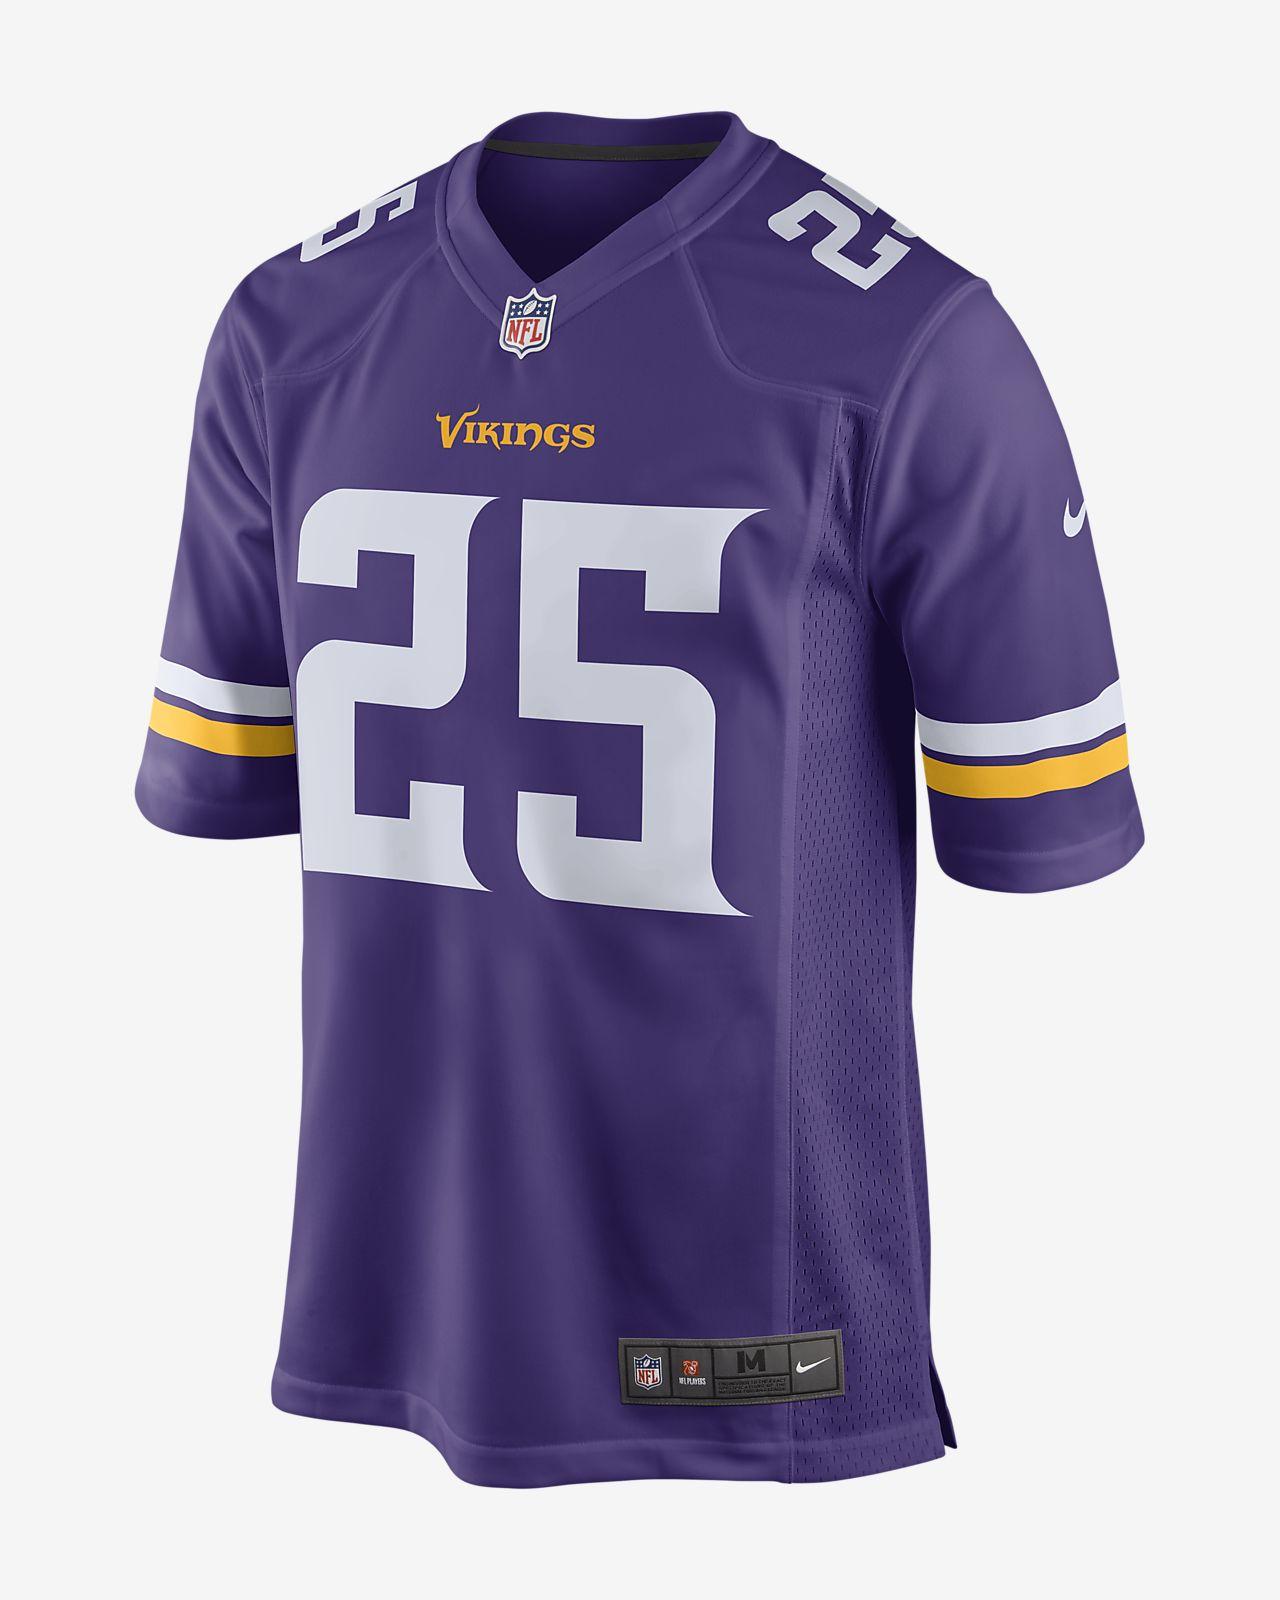 Maglia da football americano Minnesota Vikings (Latavius Murray) Home Game NFL - Uomo